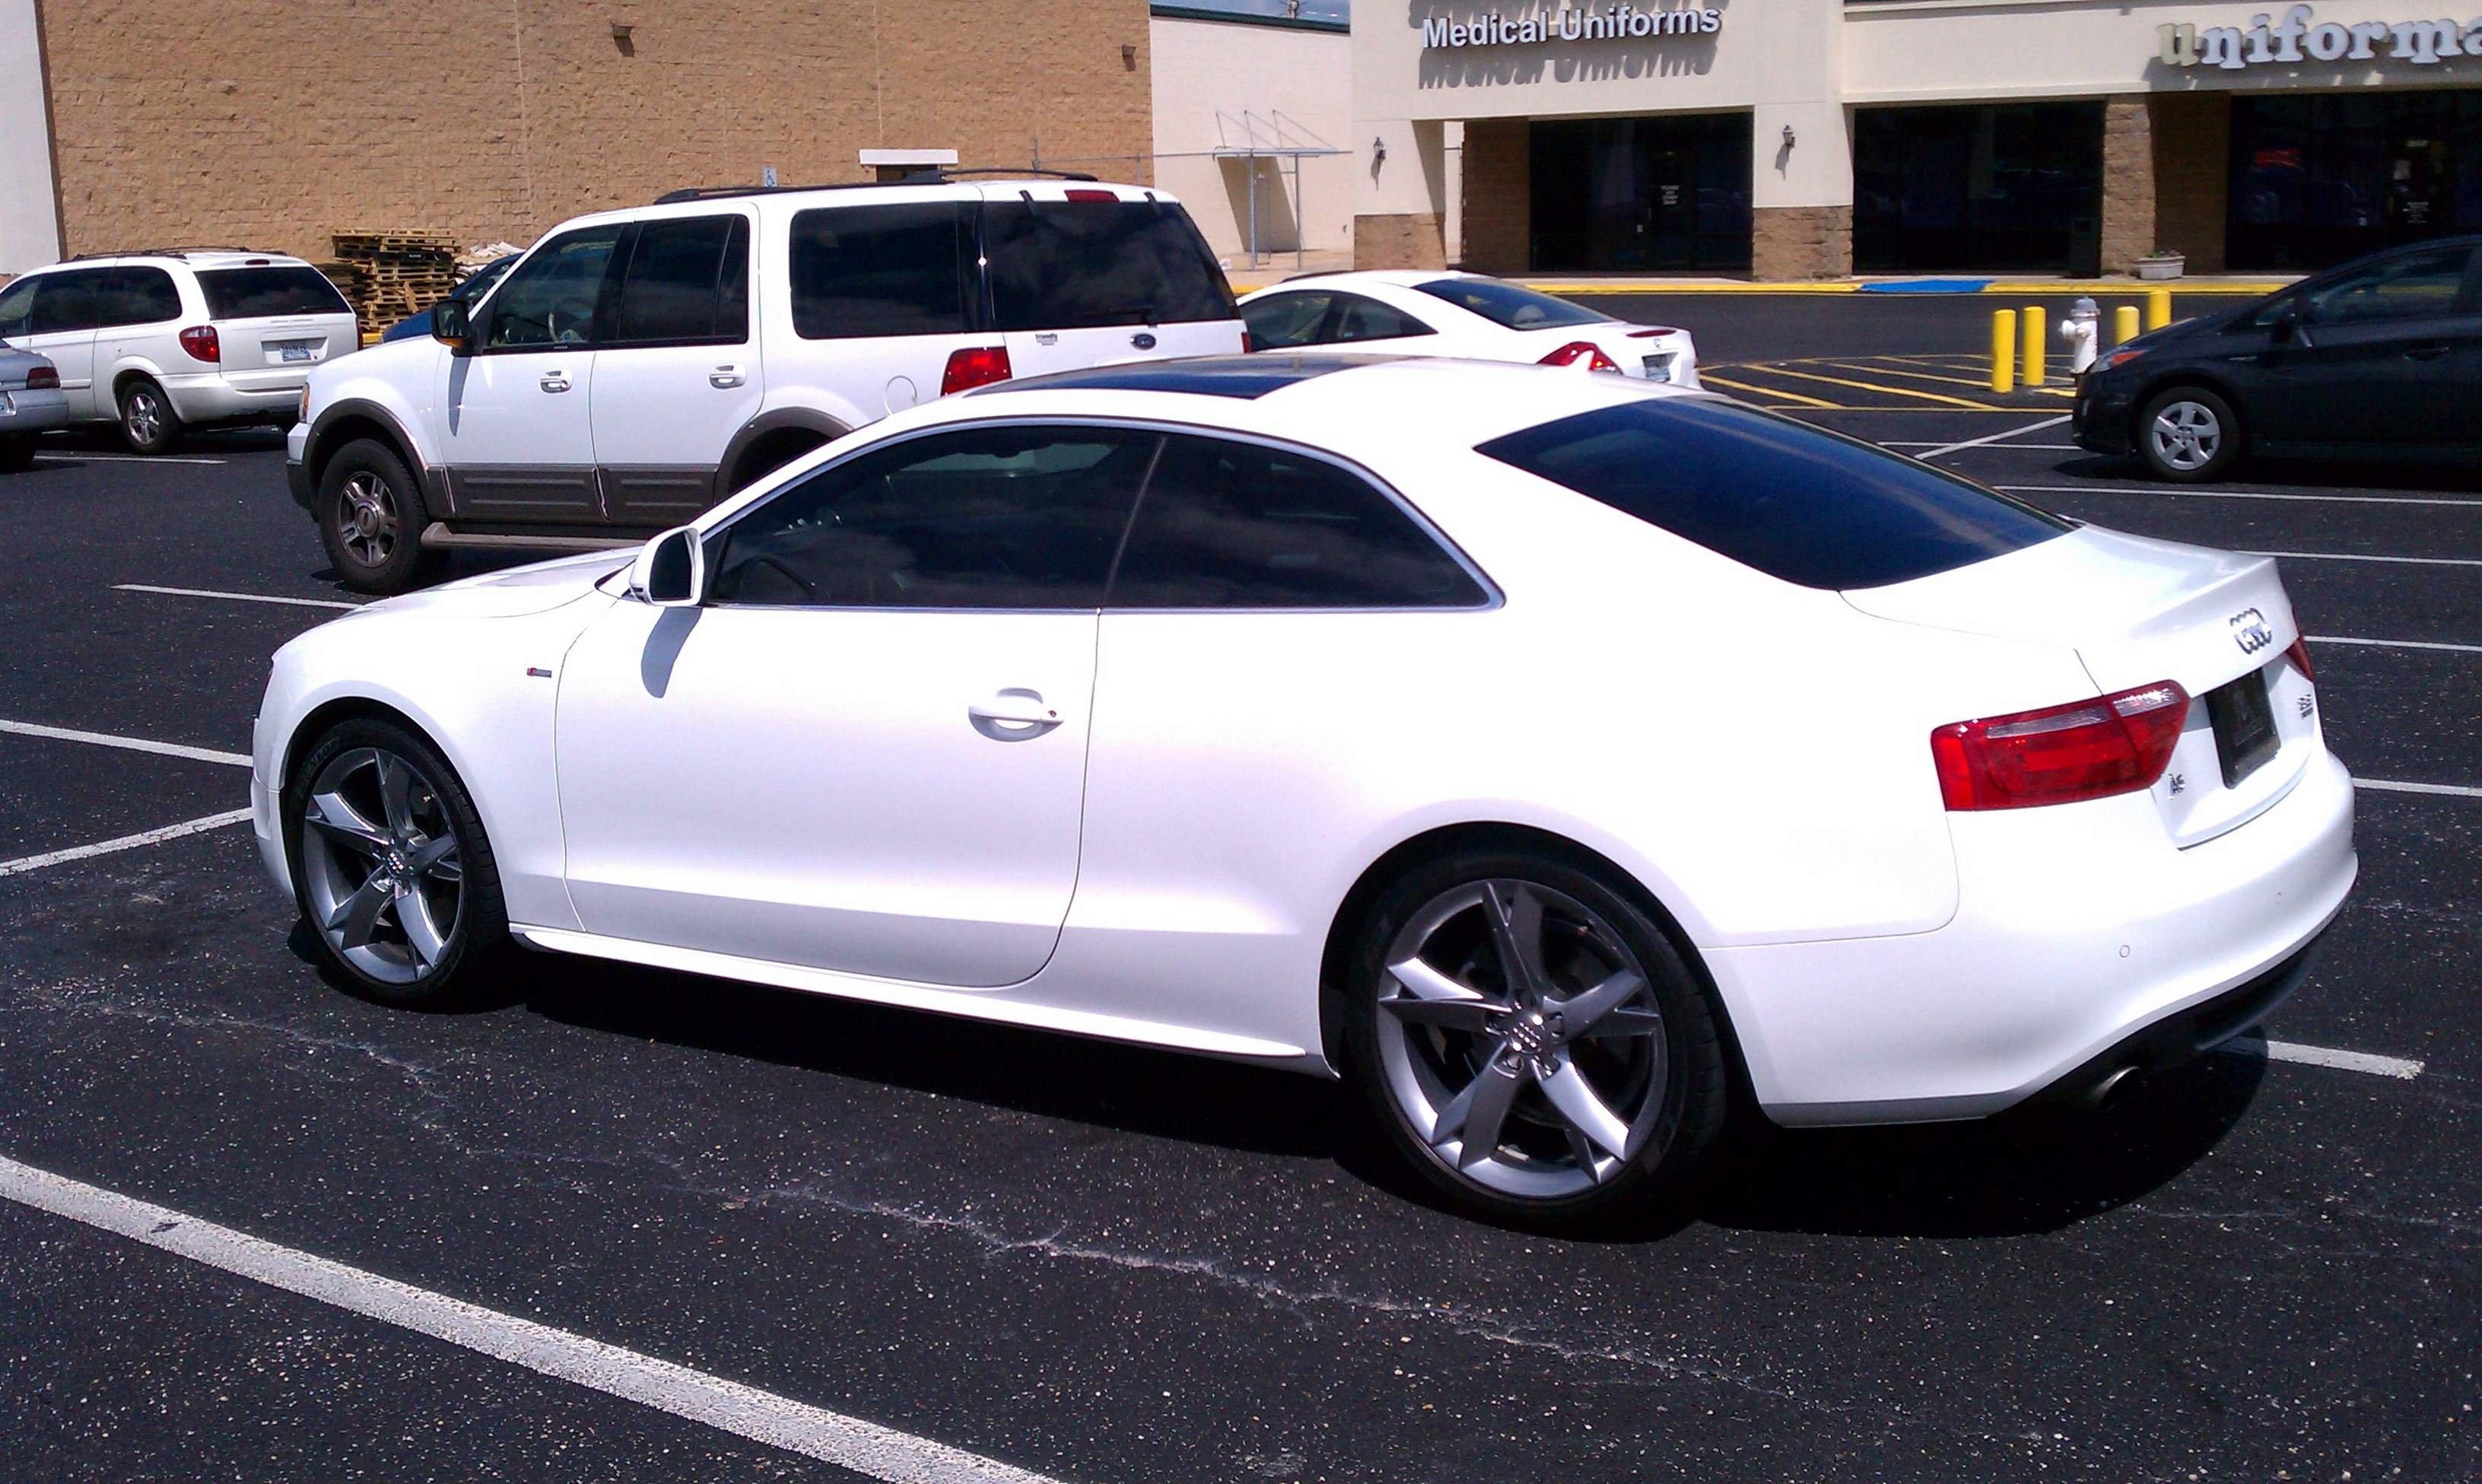 20 inch wheels - Audi A5 Forum & Audi S5 Forum